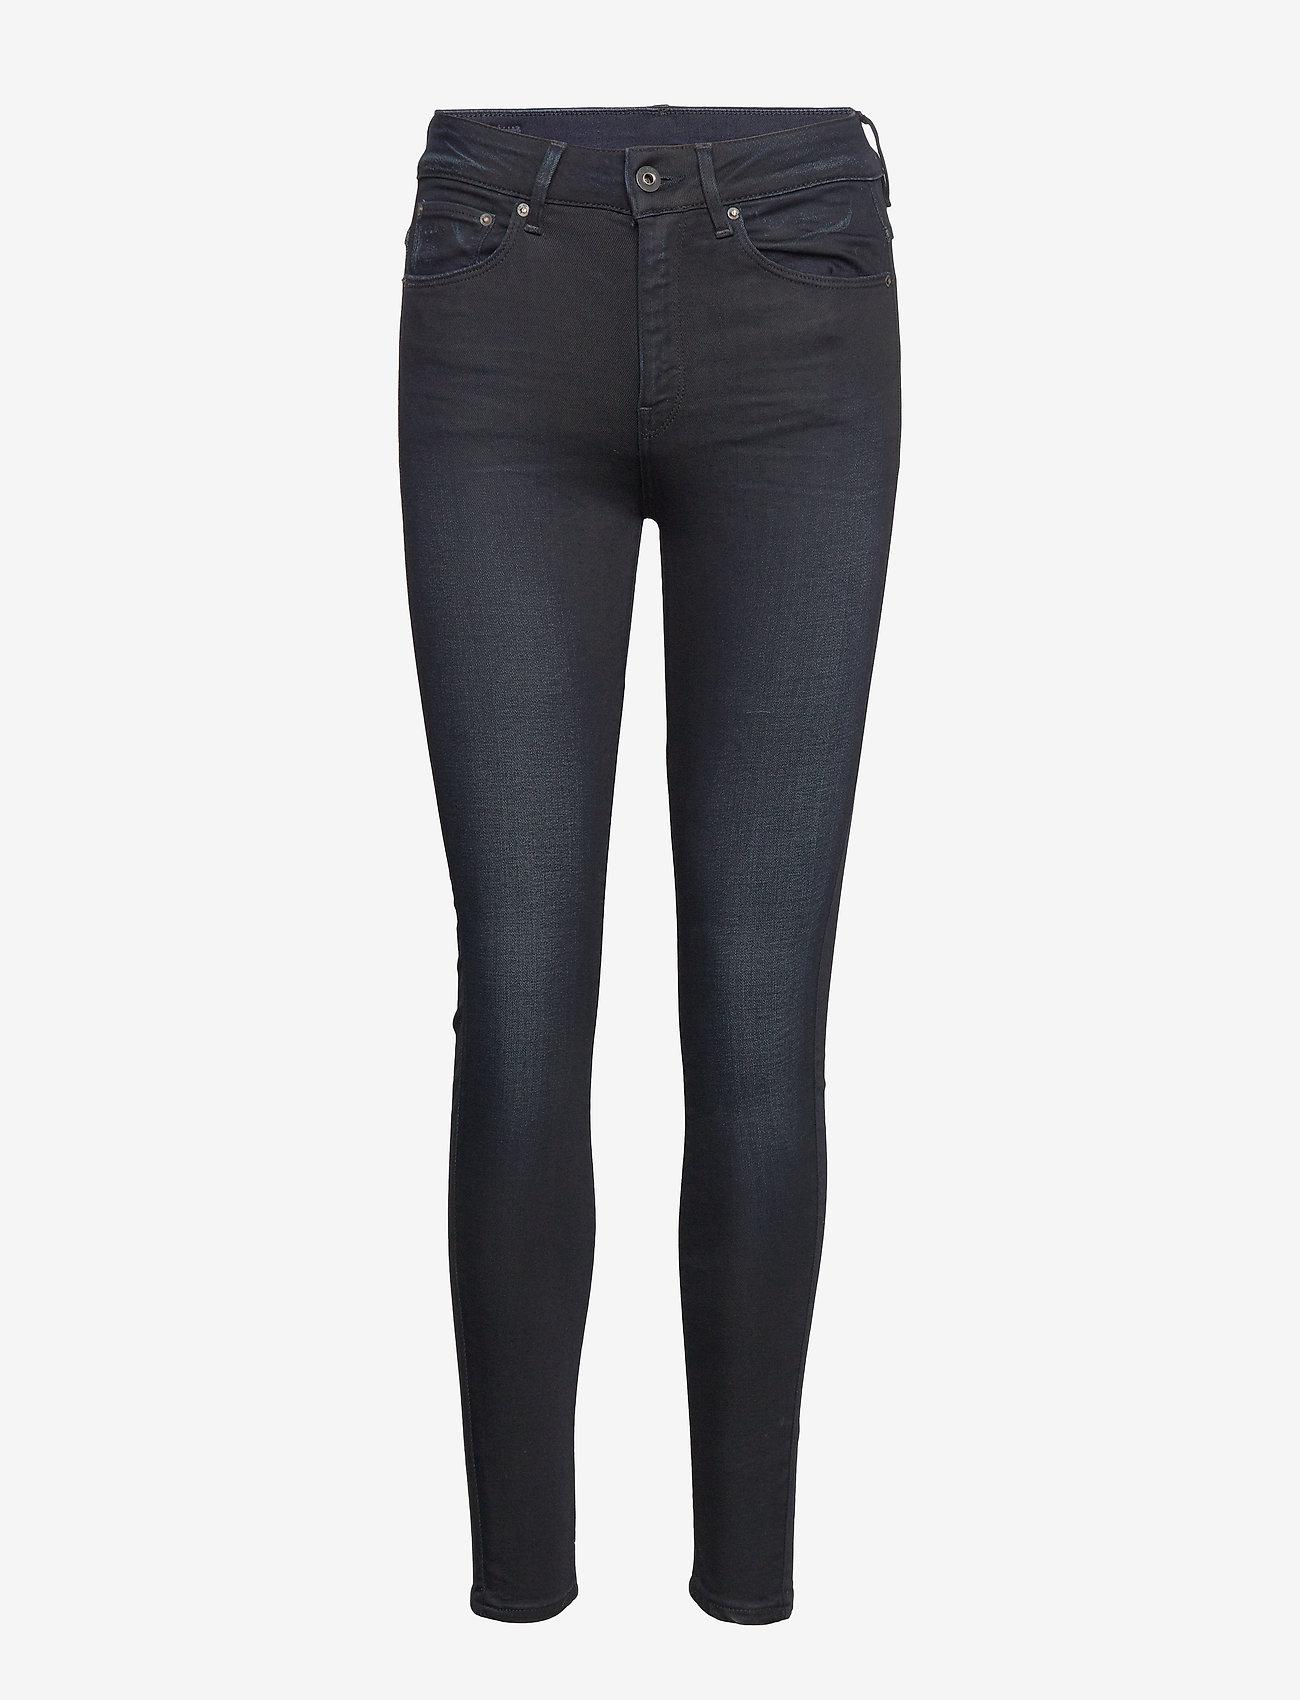 G-star RAW - 3301 High Skinny Wmn - skinny jeans - dk aged - 0